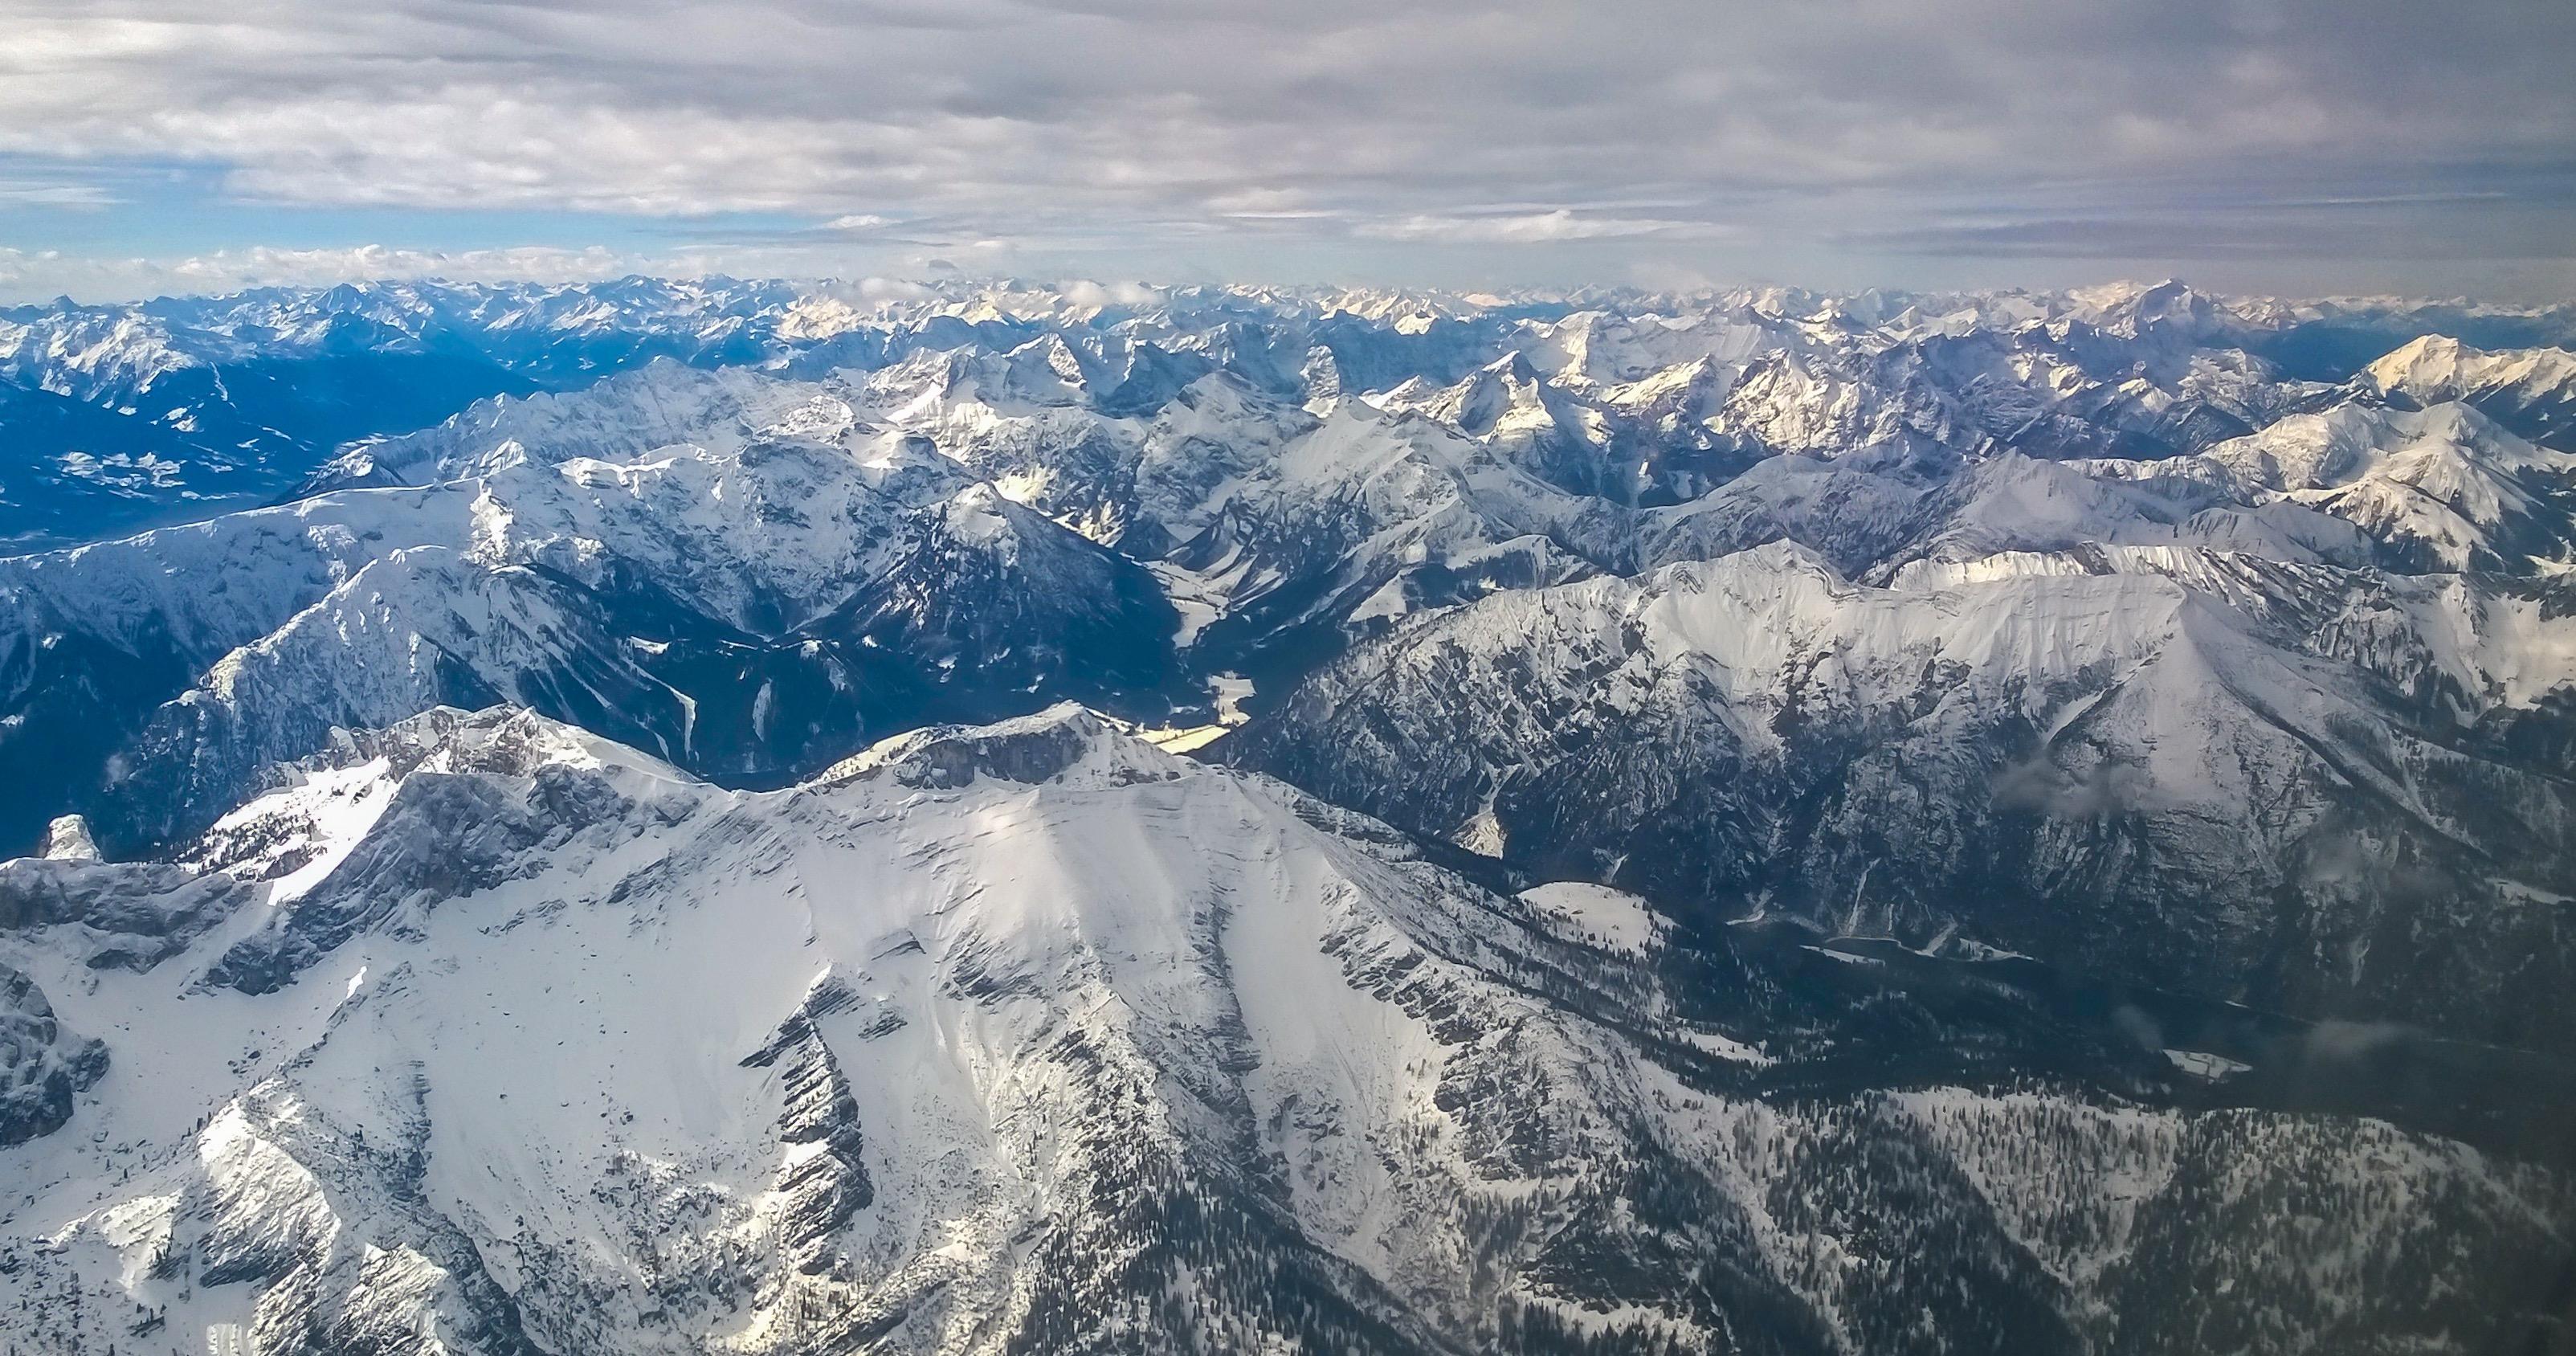 Must see Wallpaper Mountain Nokia - landscape-white-mountains-hill-sky-snow-winter-clouds-horizon-valley-Europe-lumia-landing-Austria-Alps-mount-scenery-summit-nokia-ridge-Terrain-cloud-mountain-Massif-aerial-innsbruck-atmosphere-of-earth-mountainous-landforms-aerial-photography-geological-phenomenon-mountain-range-hill-station-glacial-landform-fell-cirque-andygocher-elevation-windowseat-aeroplaneseat-925-aeroplanewindow-arete-761774  Trends_856621.jpg